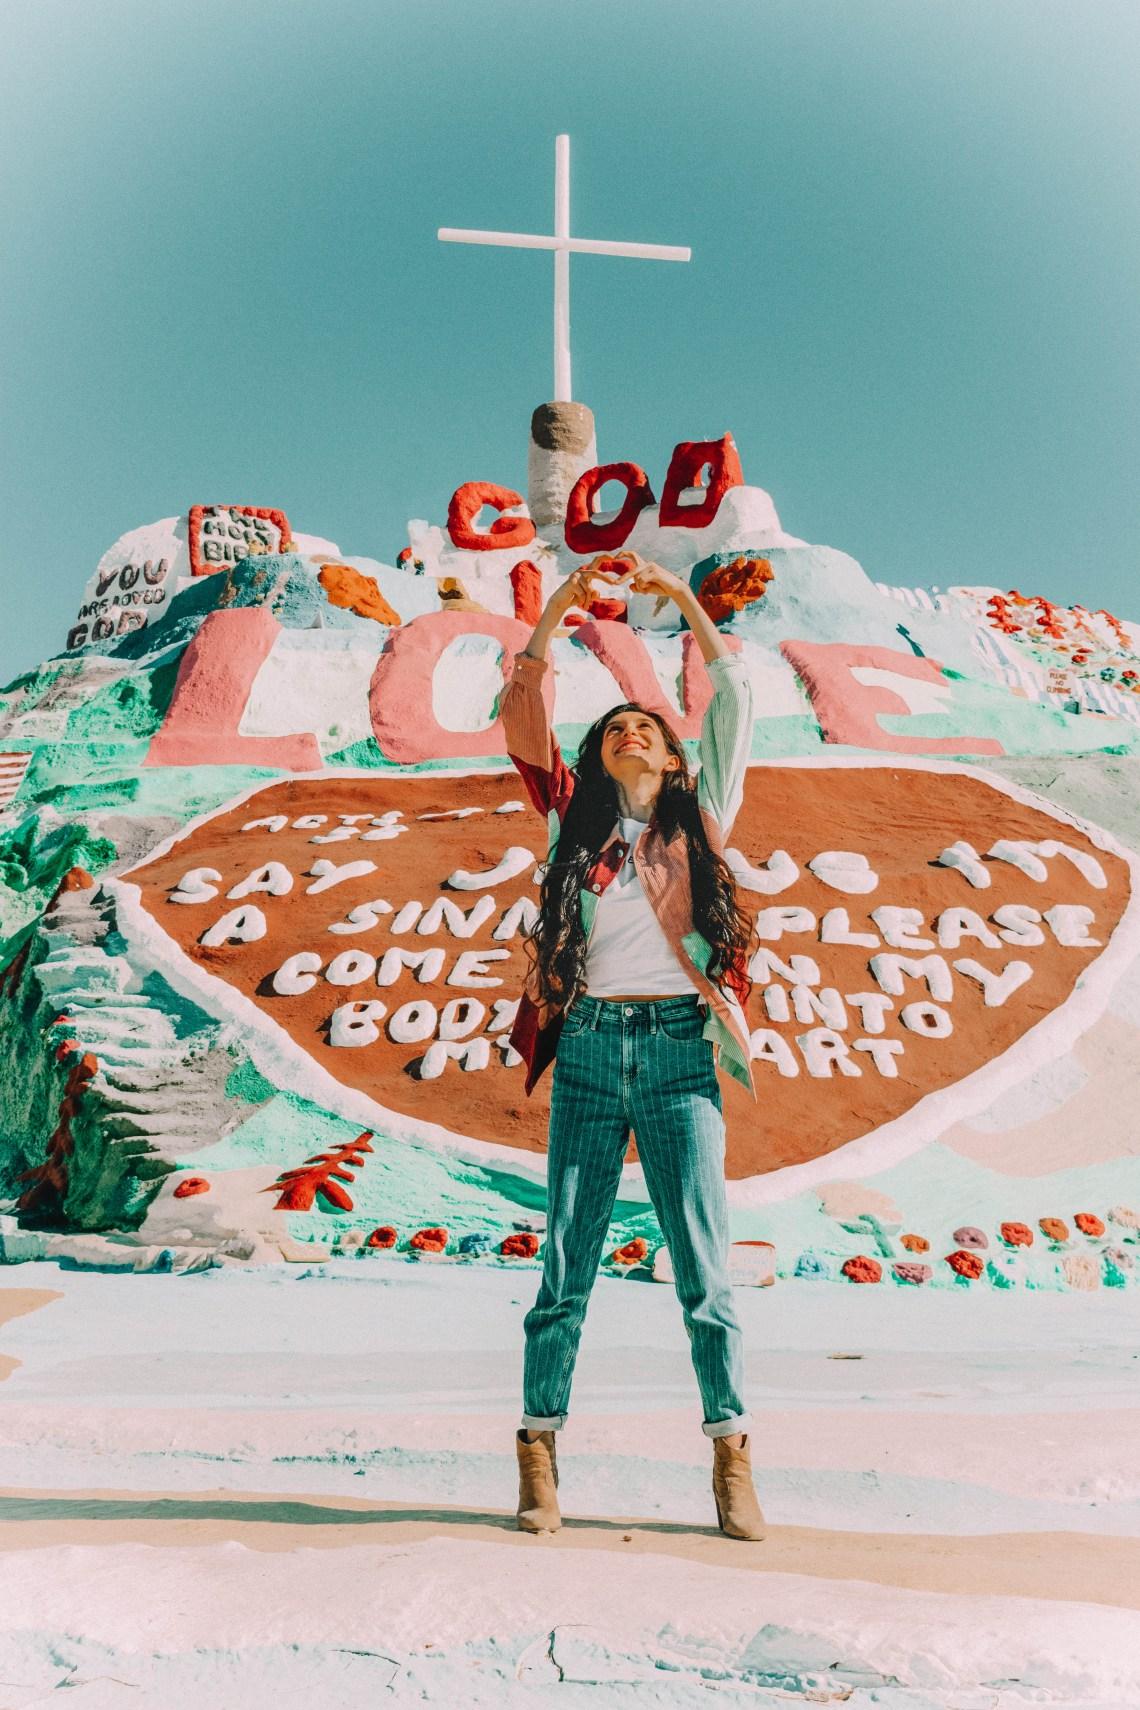 salvation mountain, art, imperial county, salton sea, God, paint, california, imperial valley, leonardo knight, bombay beach, coachella, God is Love, desert, highway 111